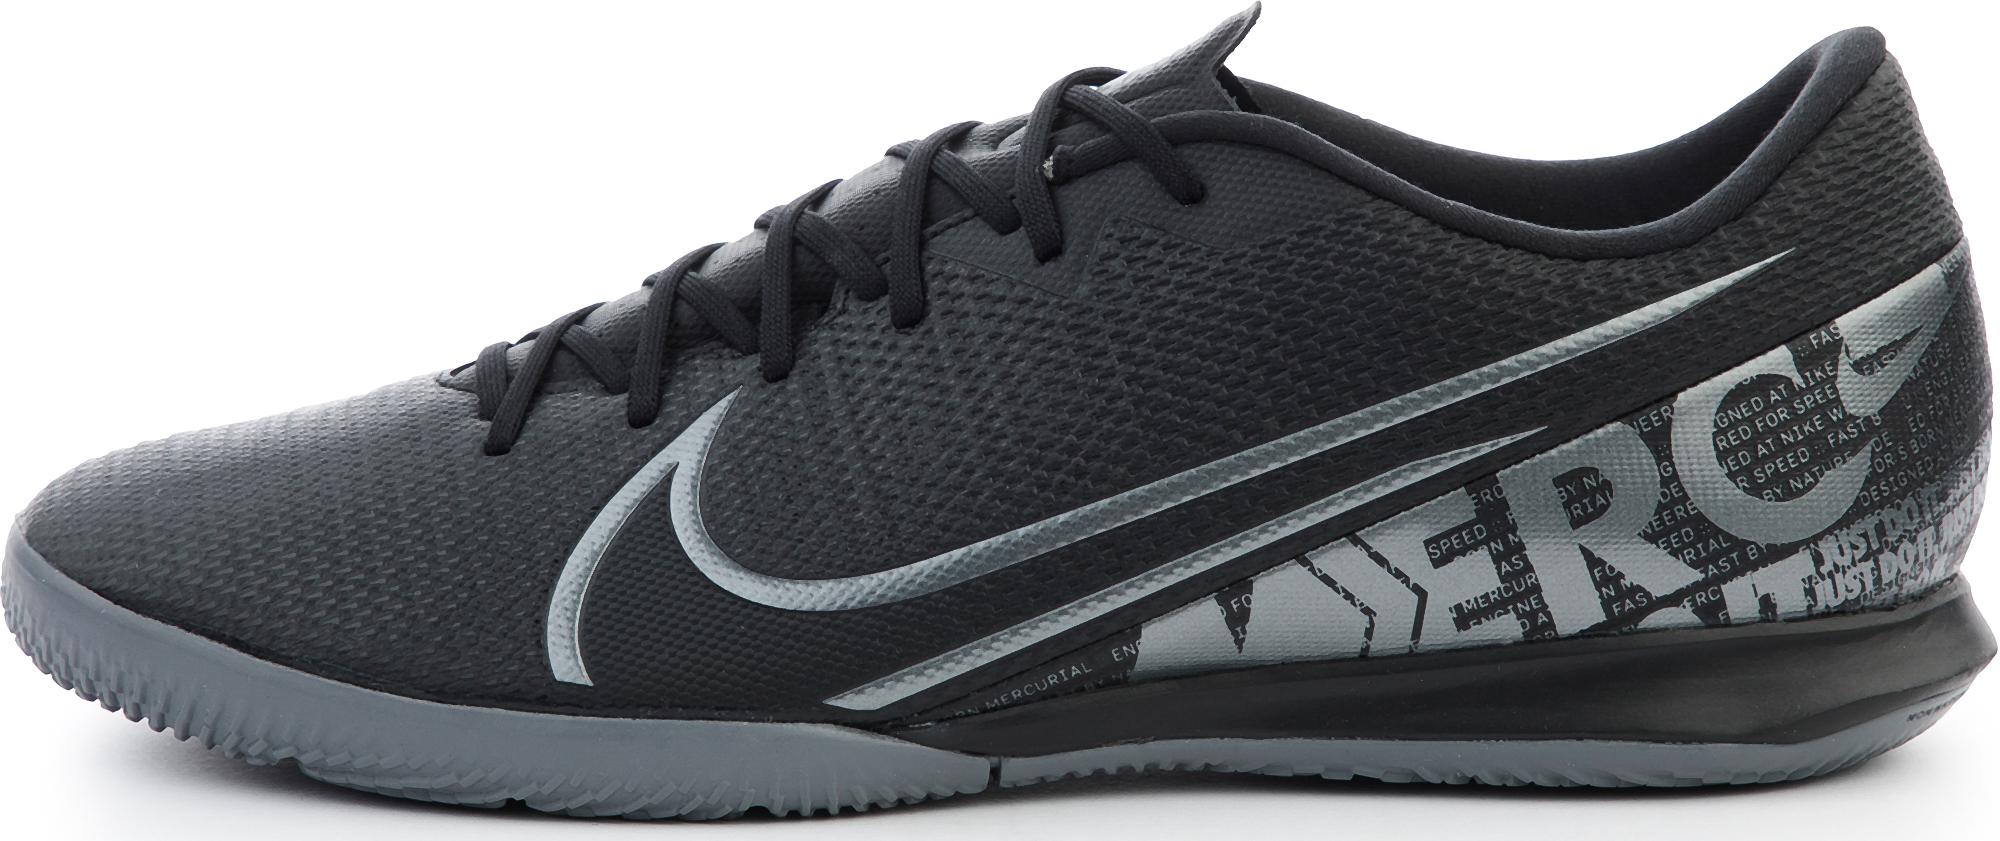 цена Nike Бутсы мужские Nike Vapor 13 Academy IC, размер 44,5 онлайн в 2017 году